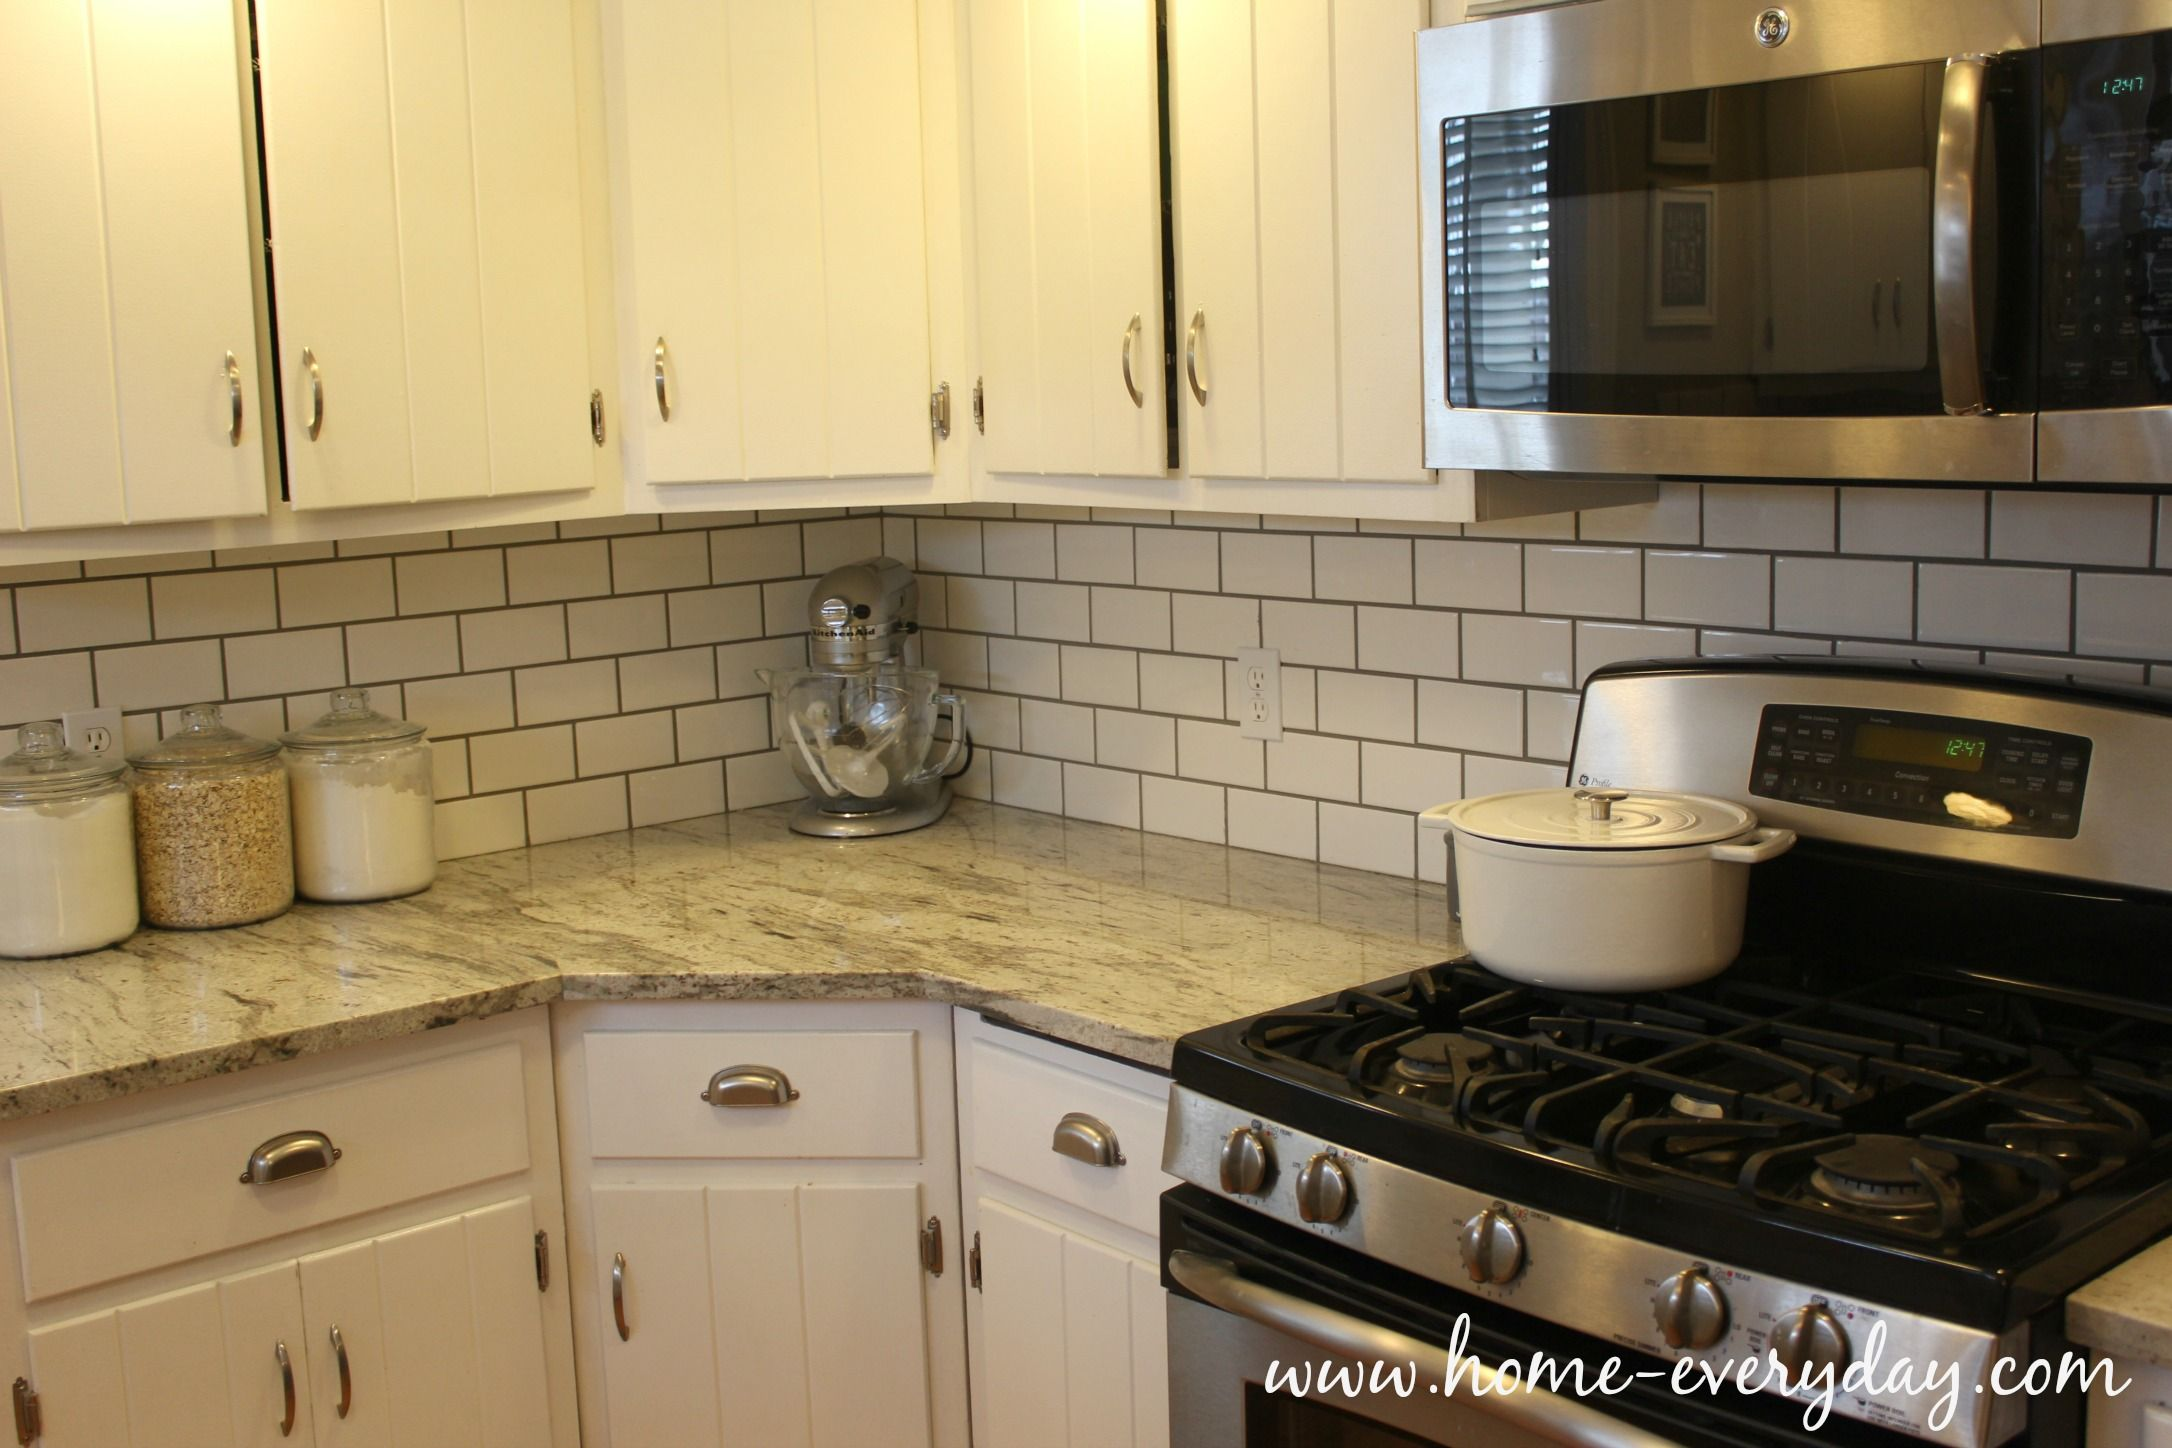 How To Install A Tile Backsplash Without Thinset Or Mastic Kitchen Backsplash Designs Kitchen Without Backsplash Kitchen Countertops Laminate